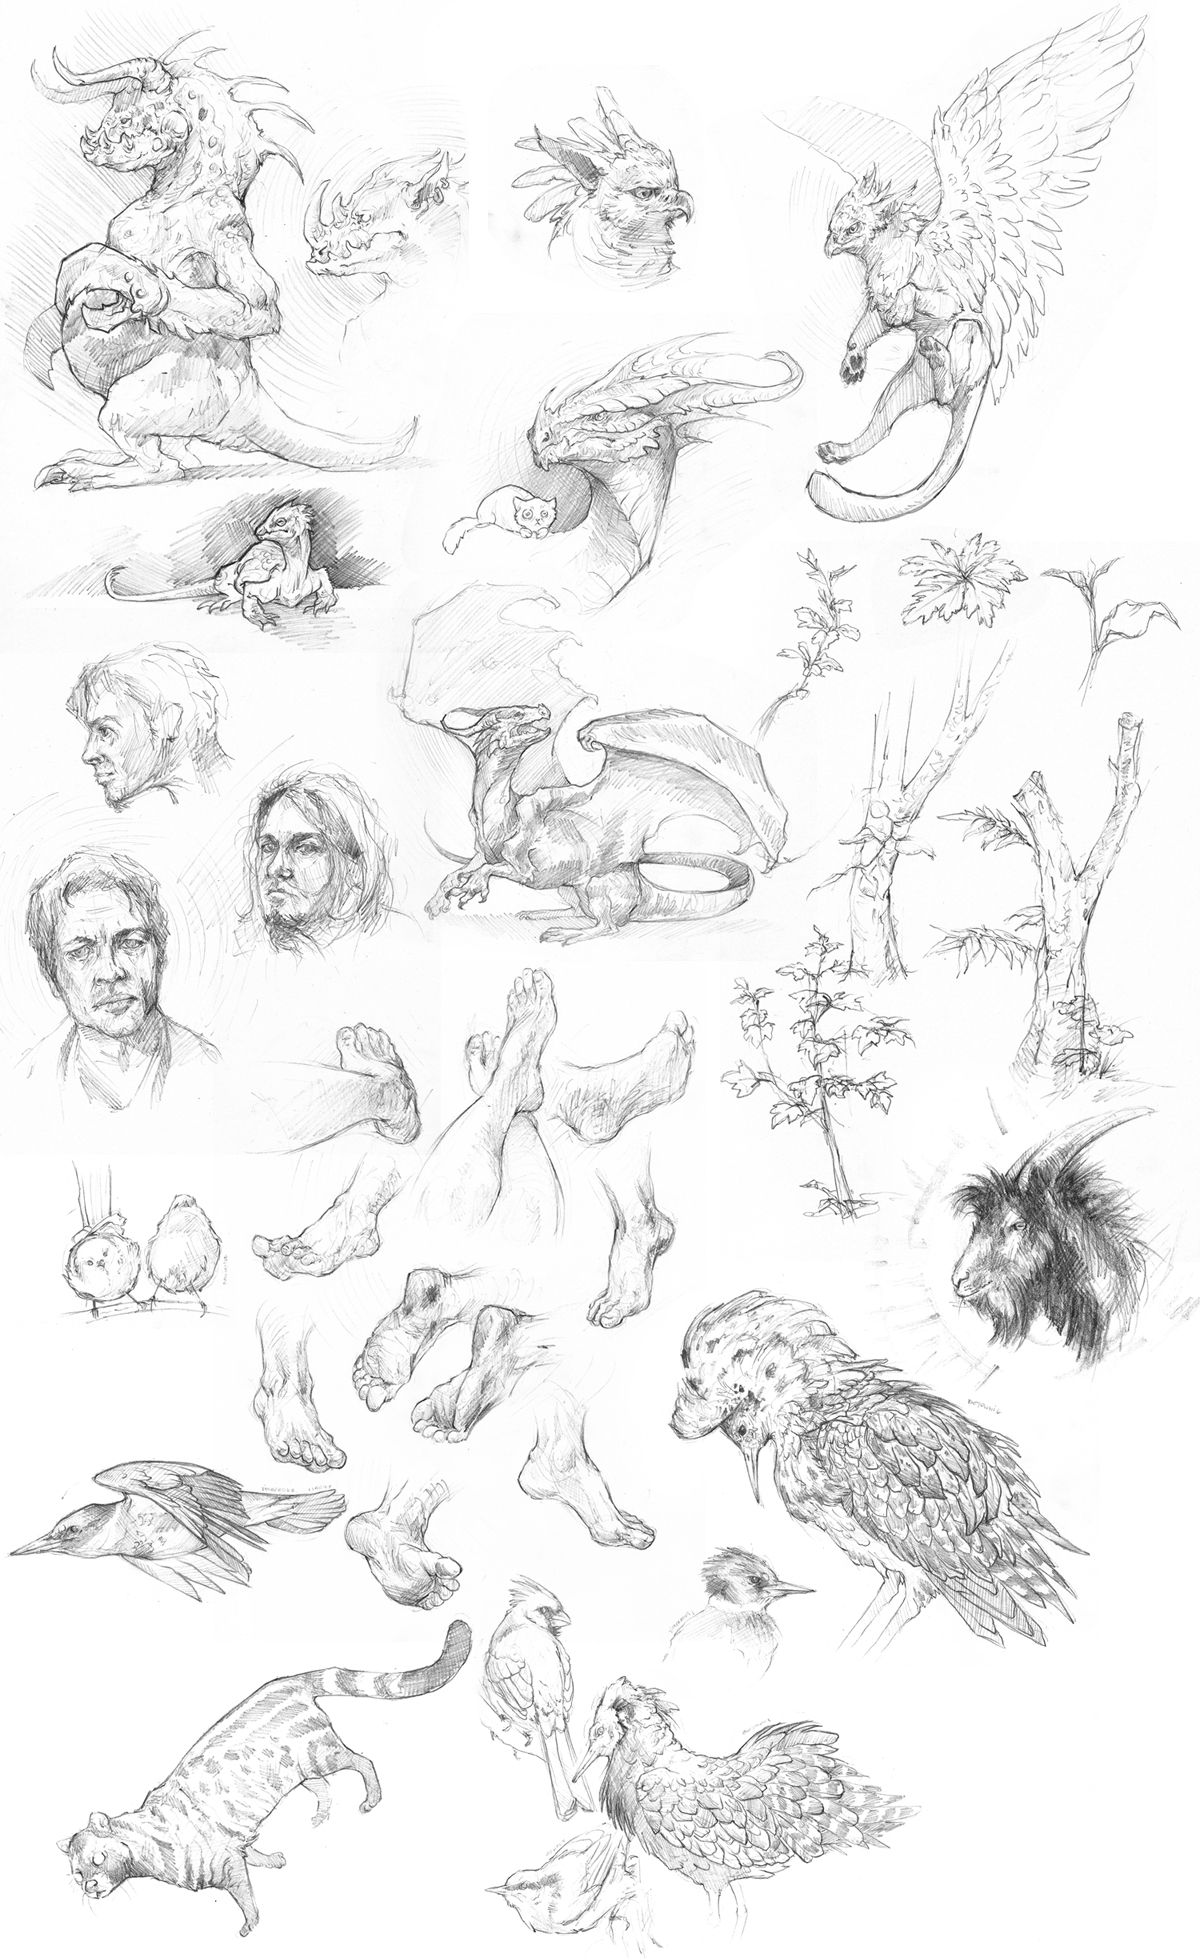 Sketches by Woari